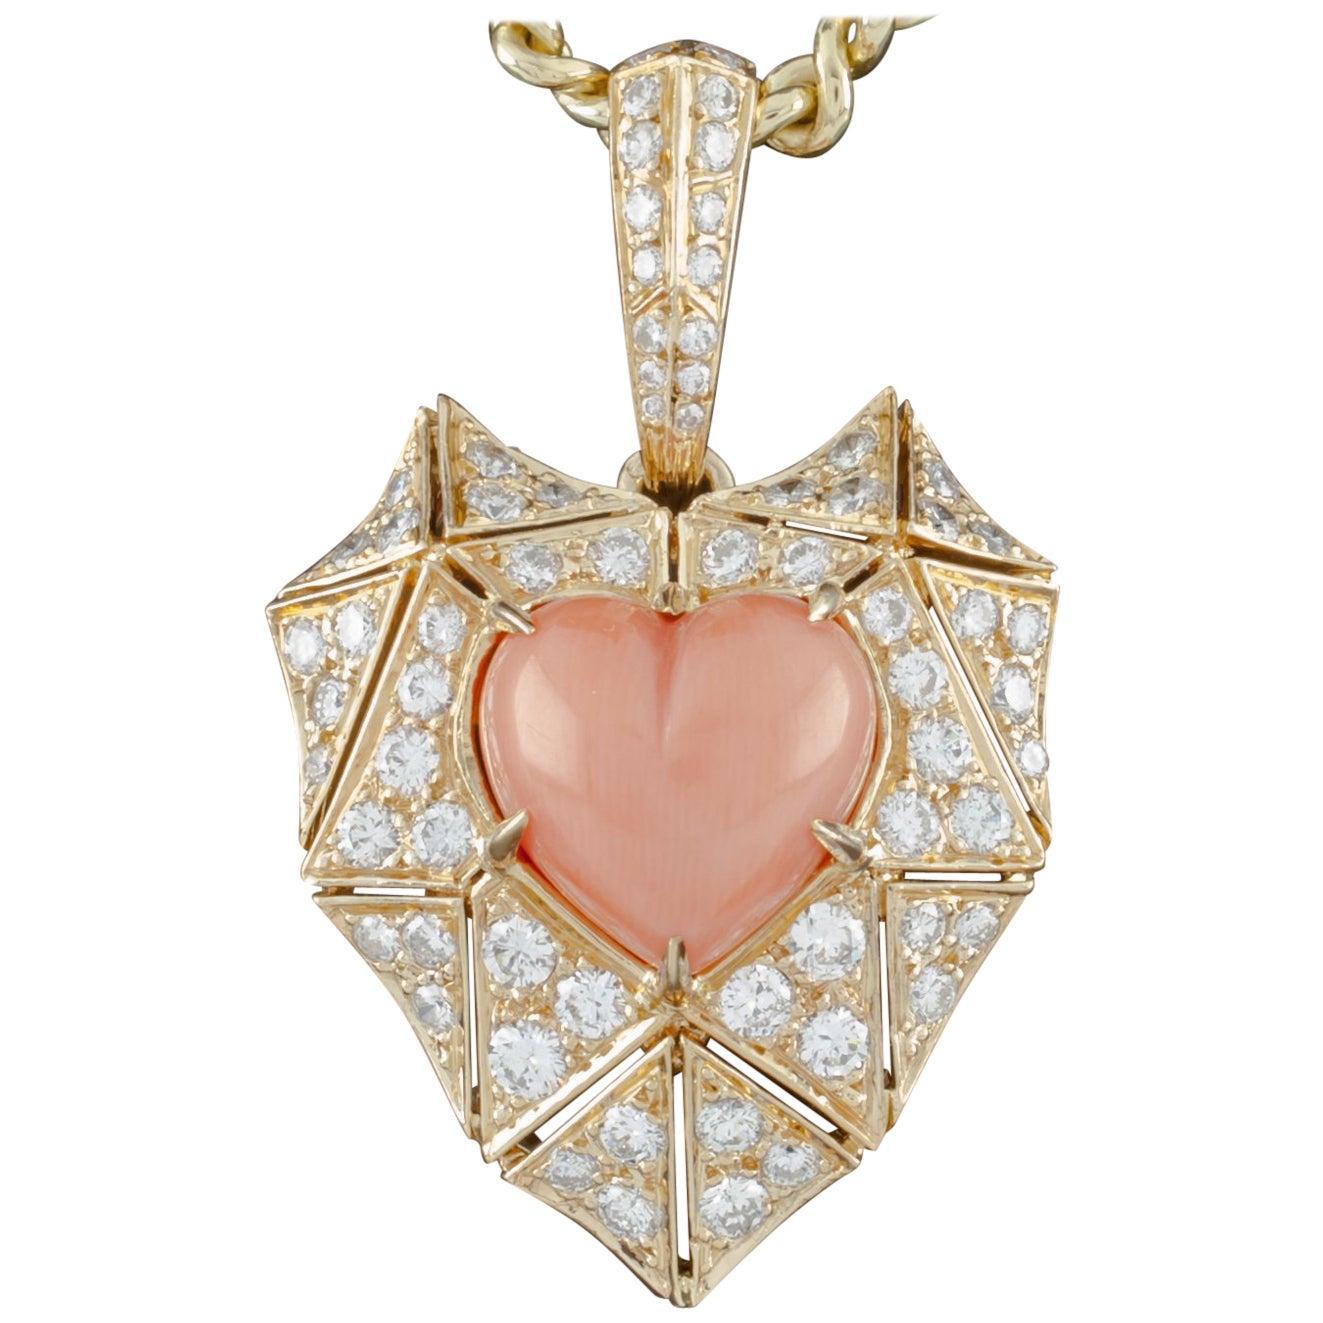 Bulgari Bvlgari High Jewelry Diamond and Coral Heart 18 Karat Gold Pendant